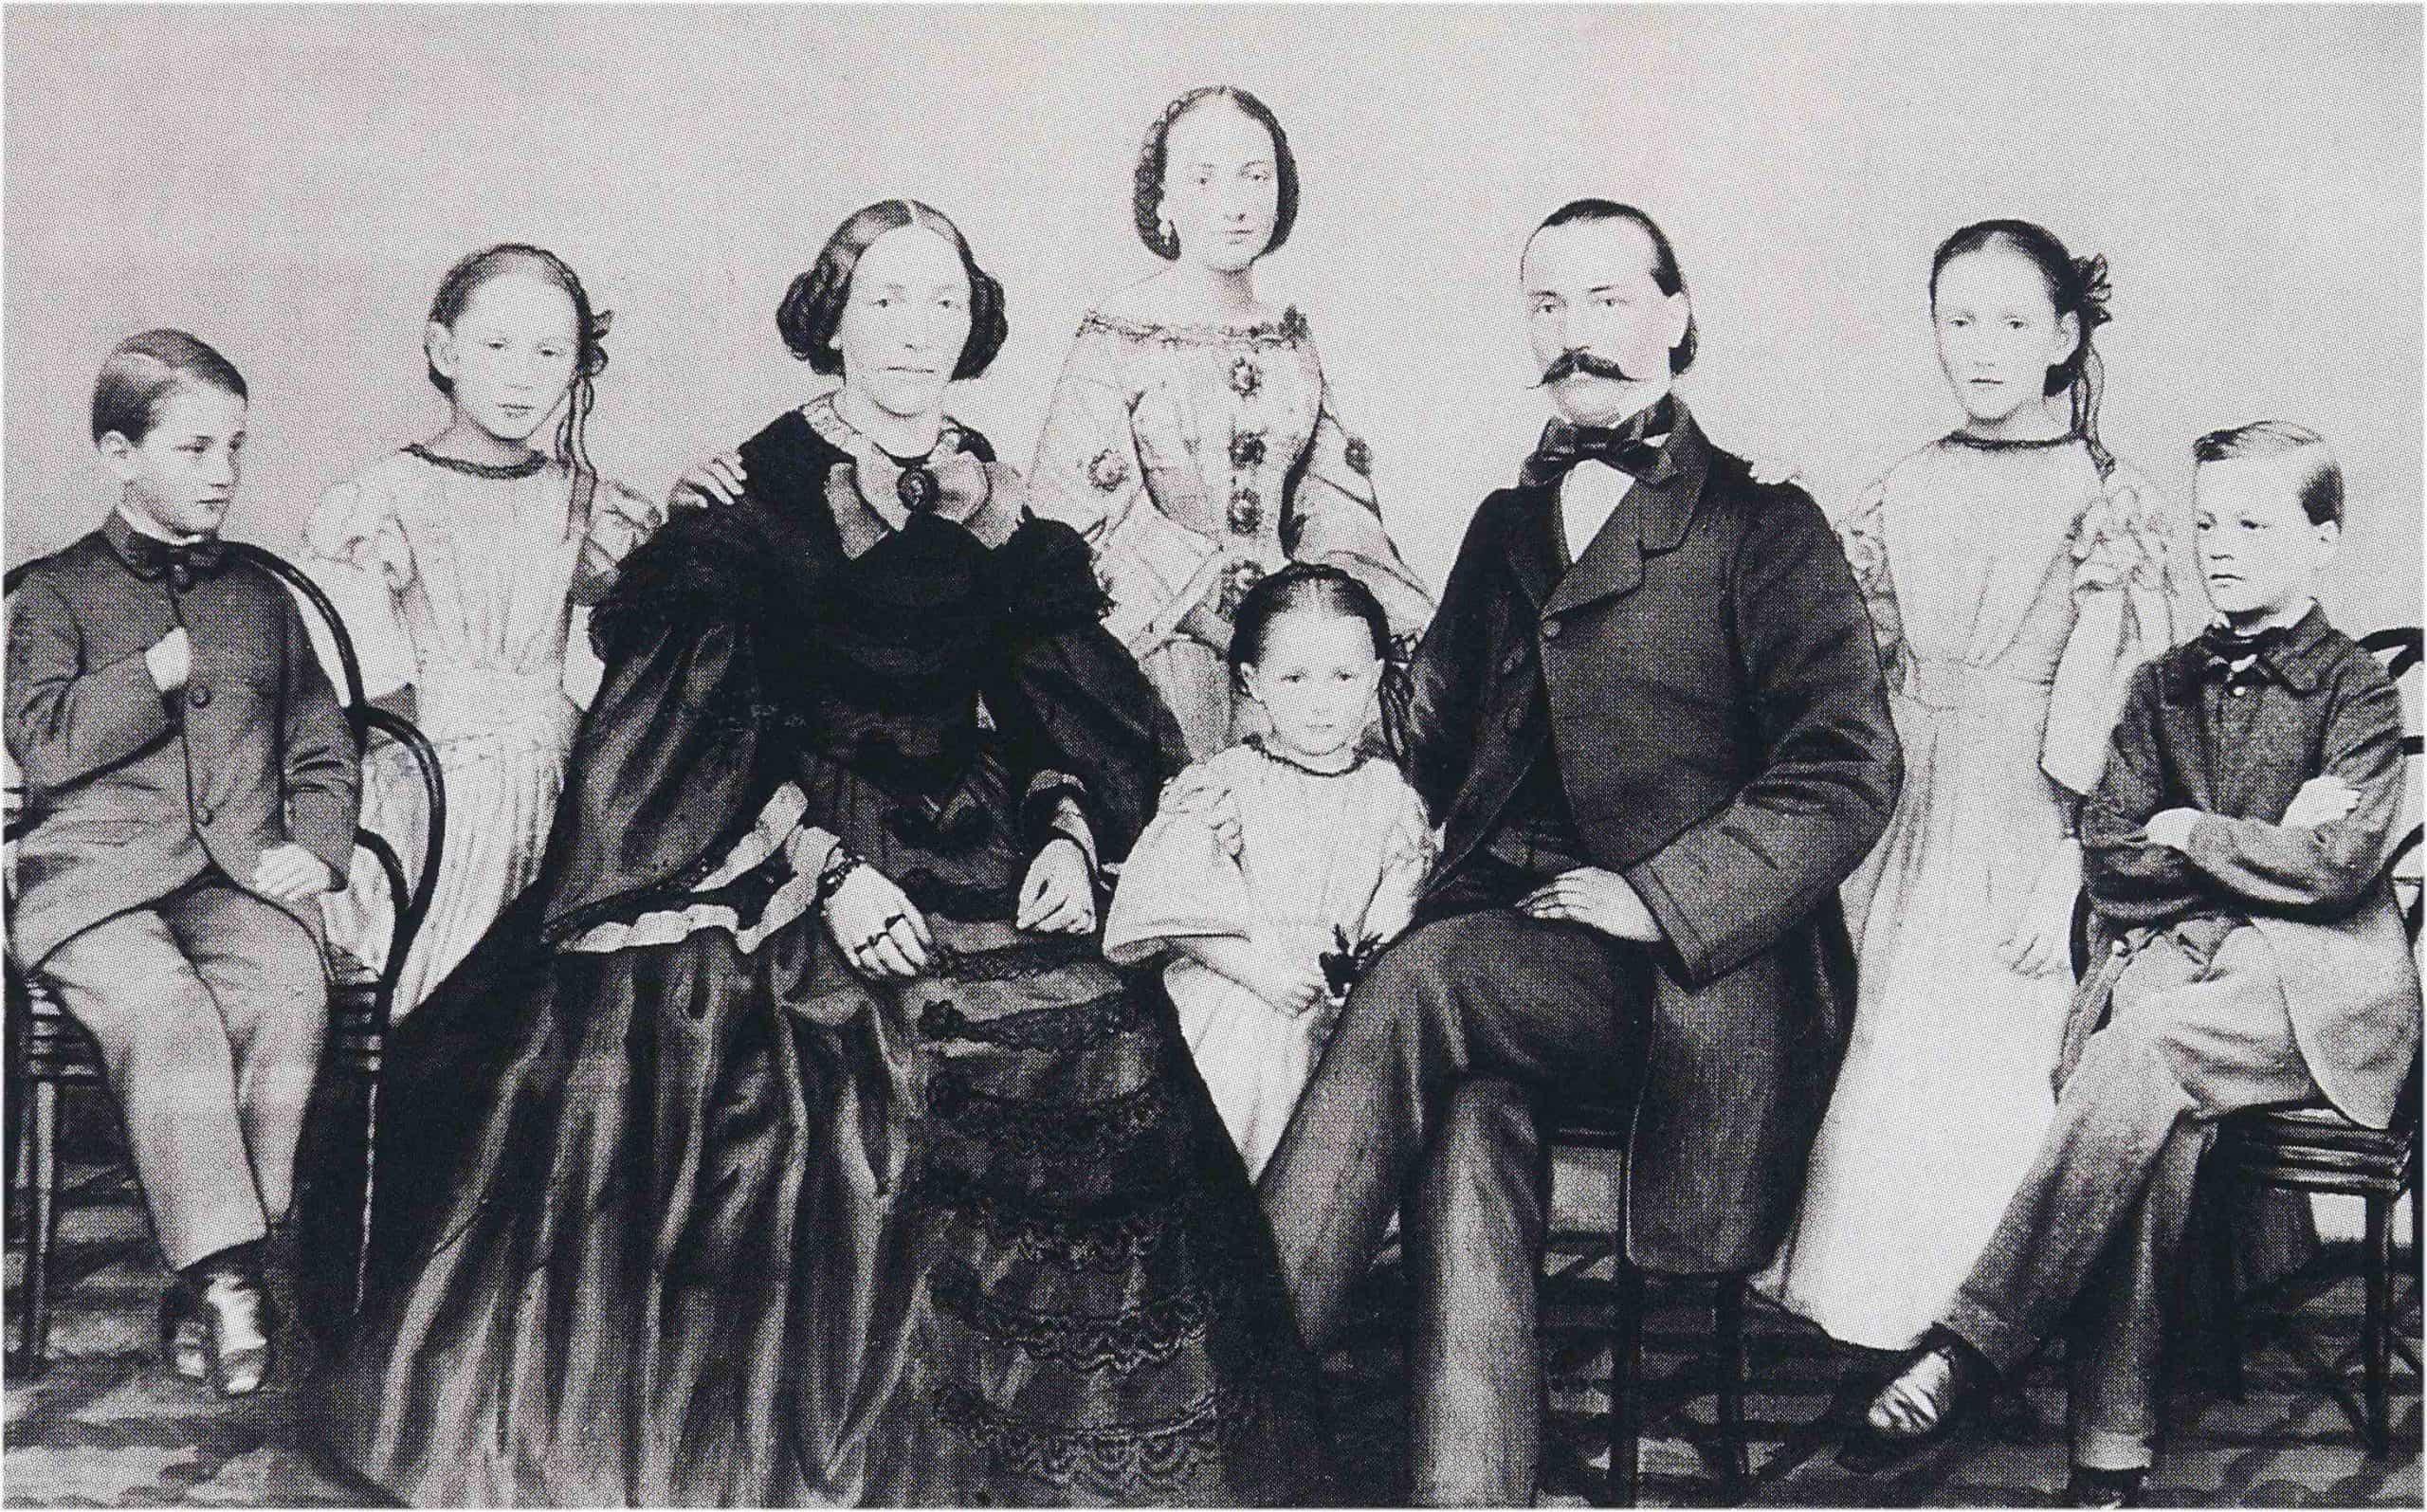 Junghans Gründer Erhard Junghans im Familienverbund